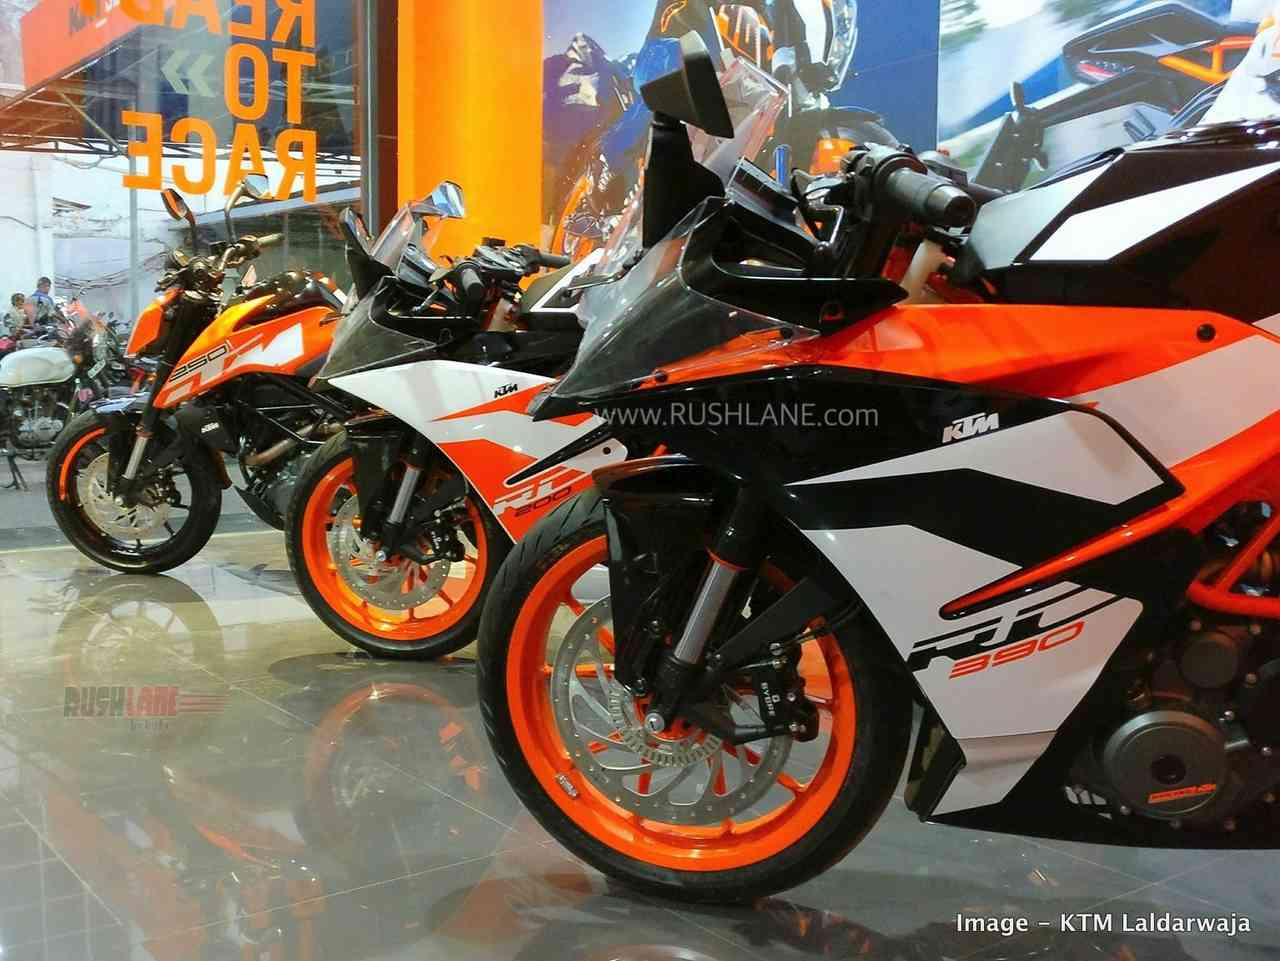 KTM India sales